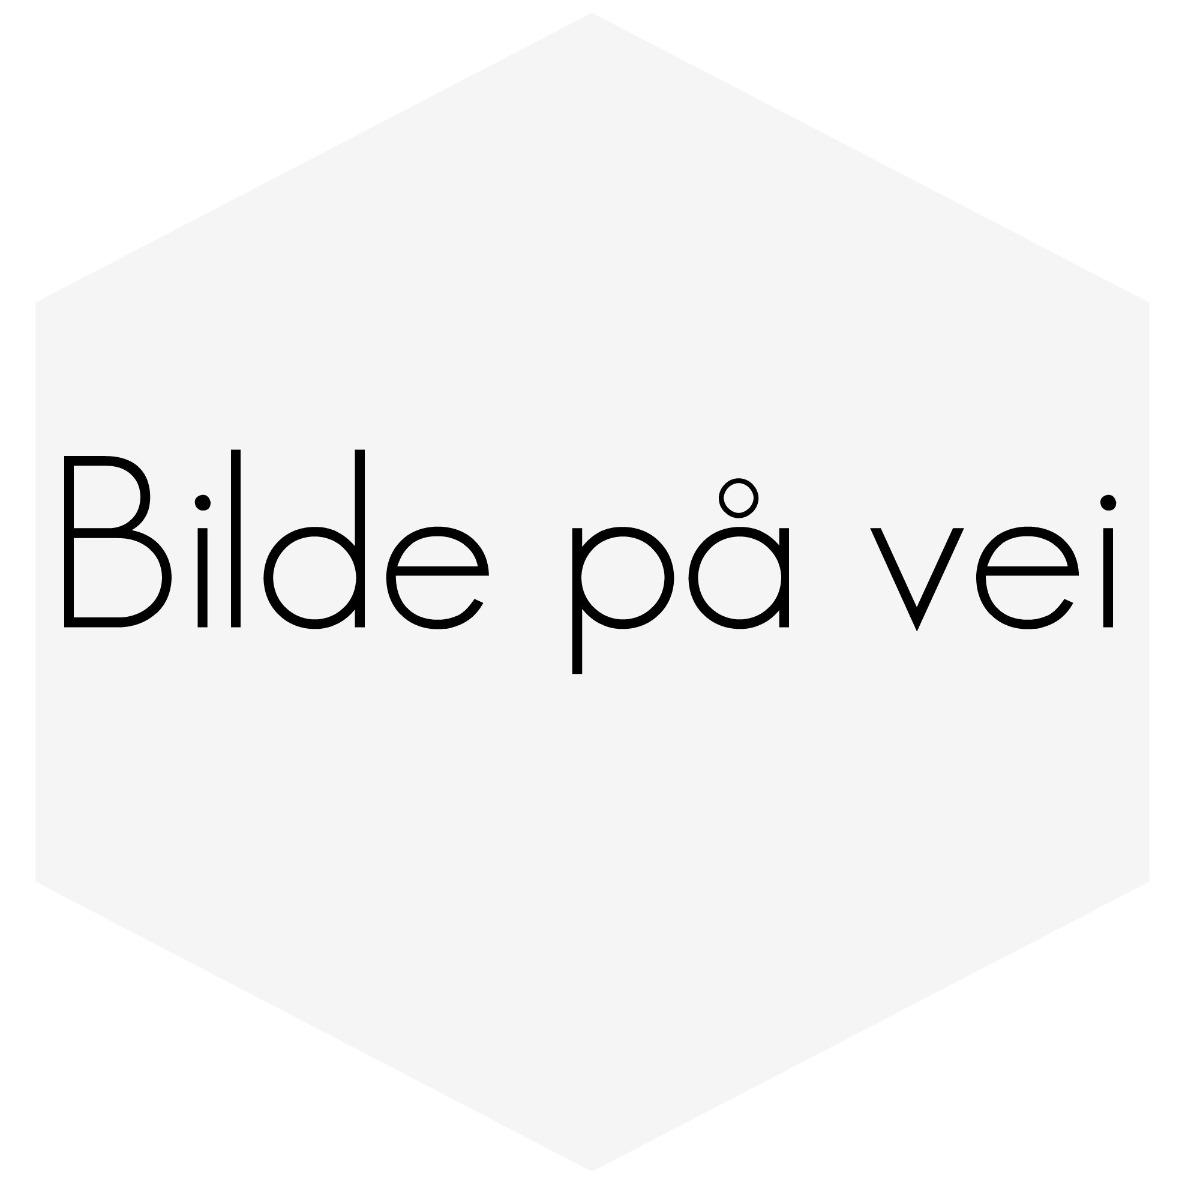 VENTIL INNSUG B19,B21,B23,B230,B200 (IKKE K.)463395 stk.pris